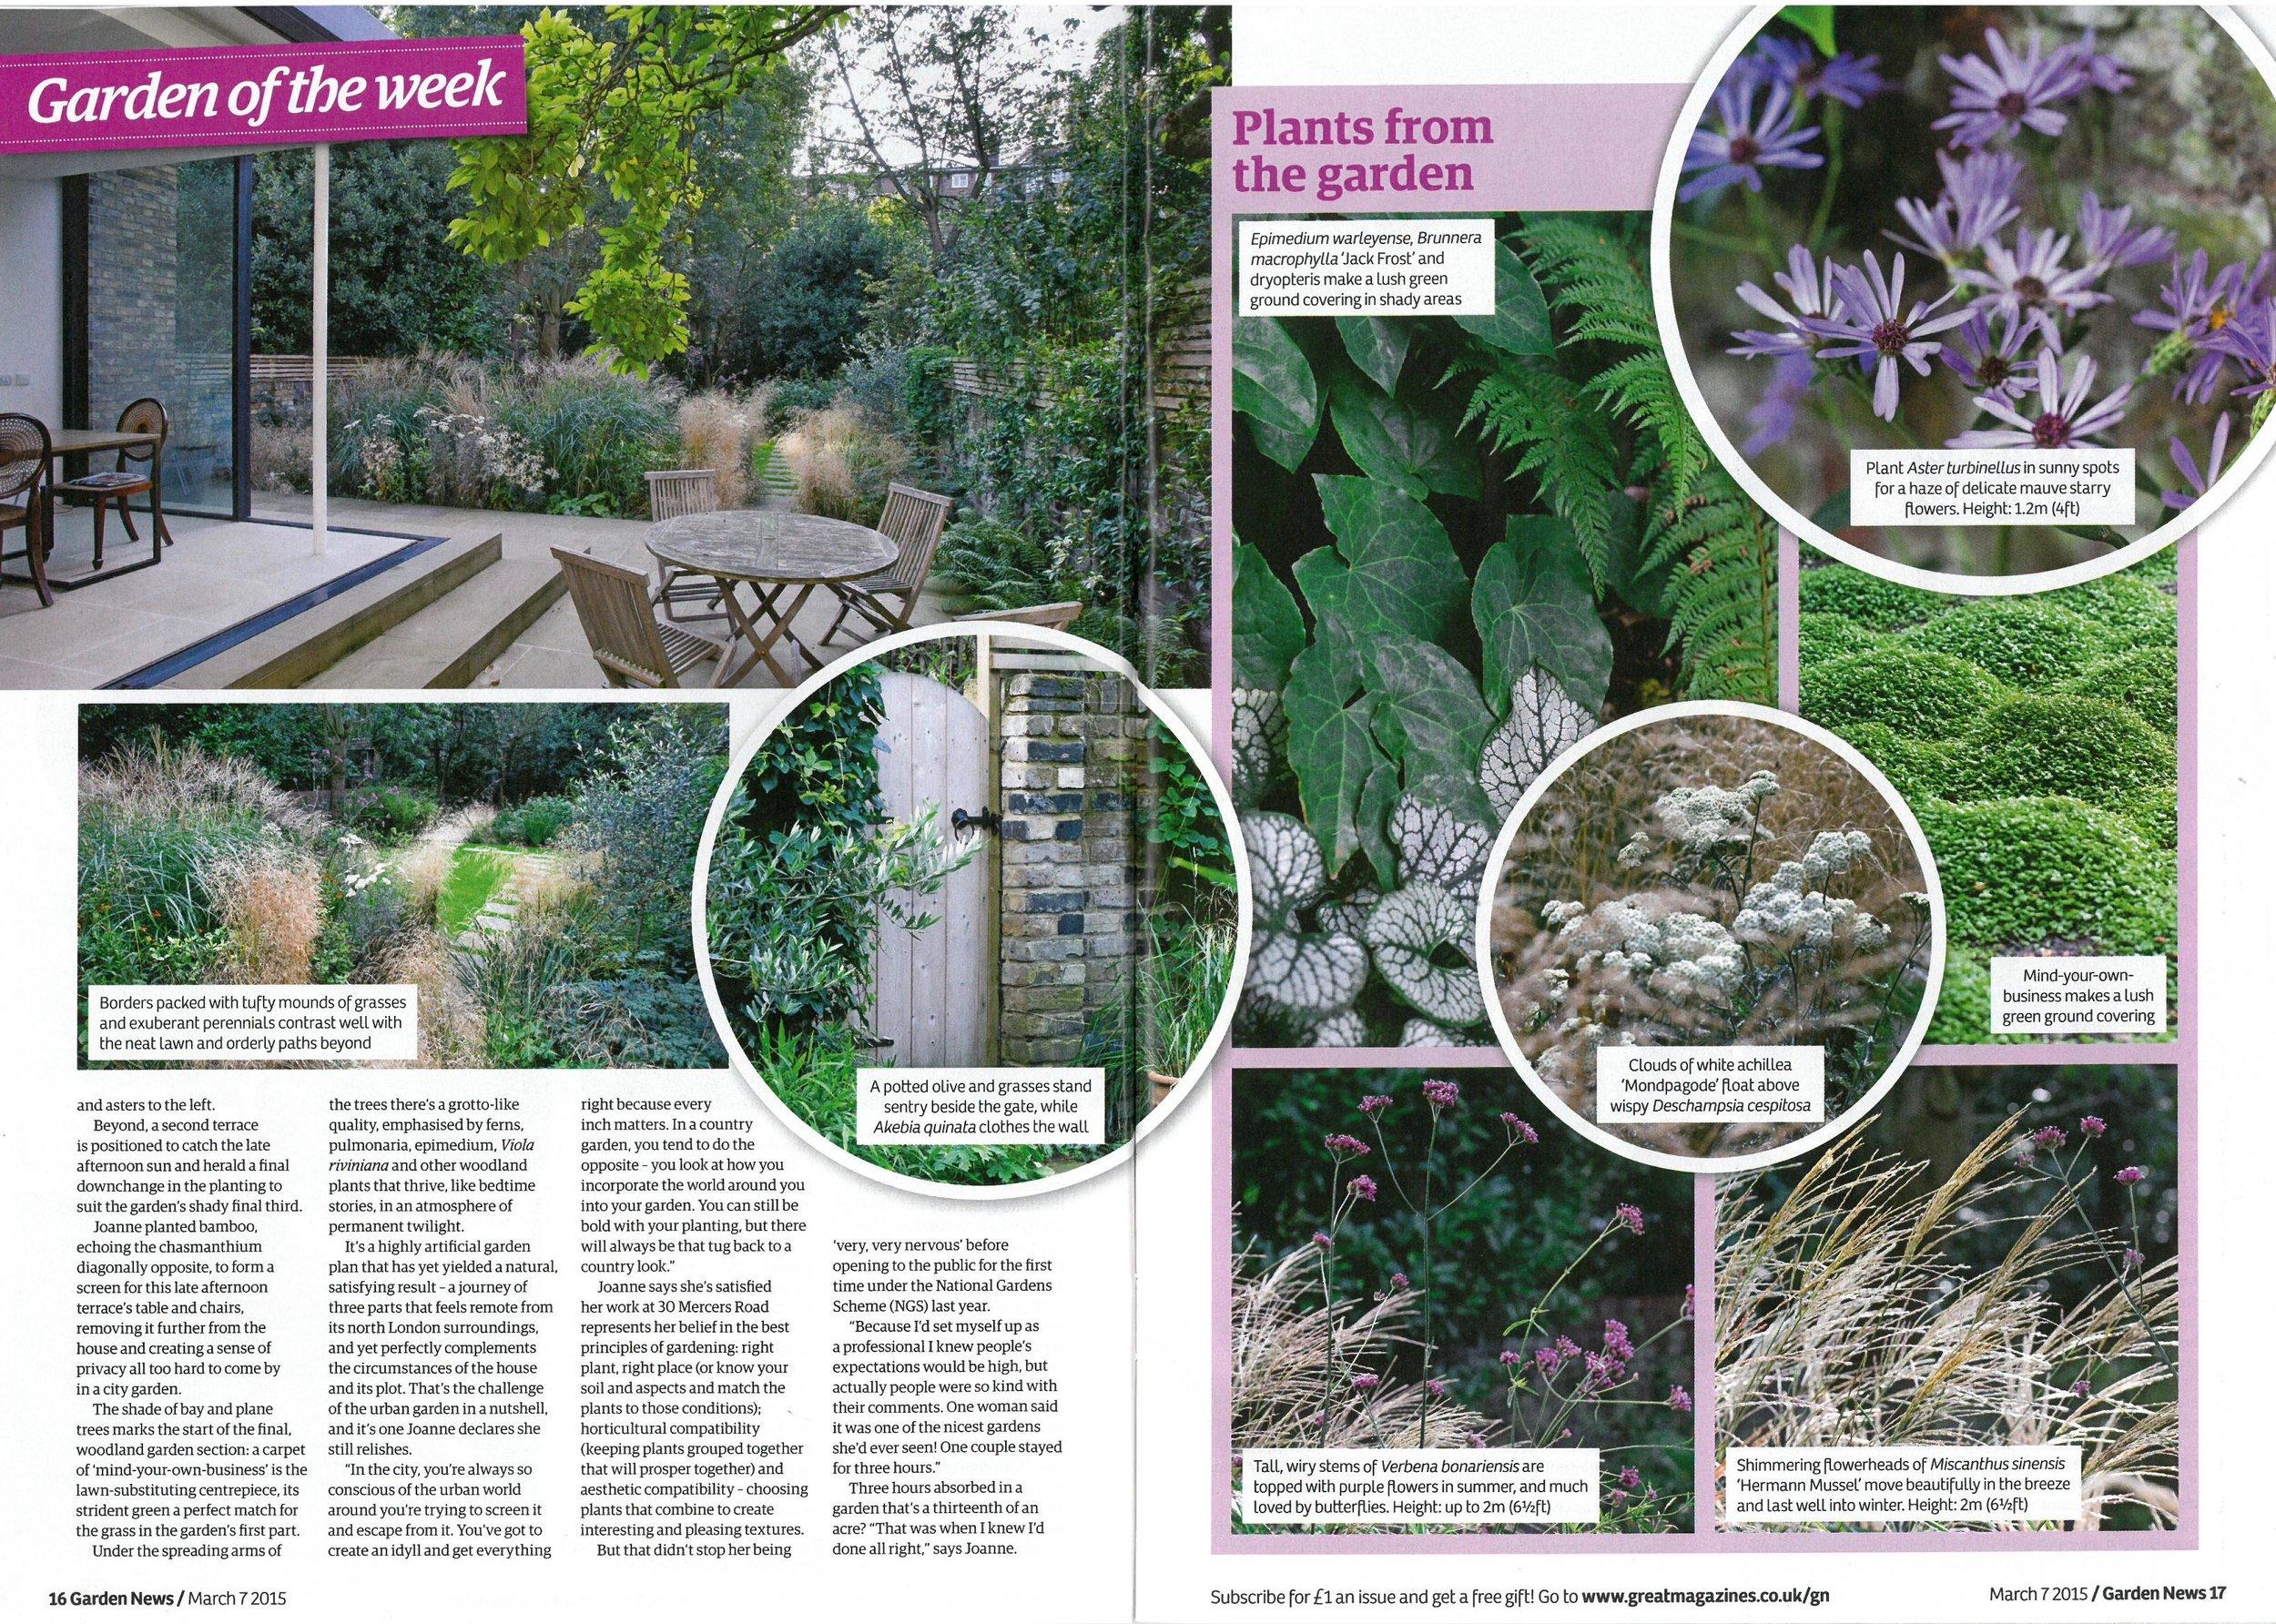 Garden News, March 2015